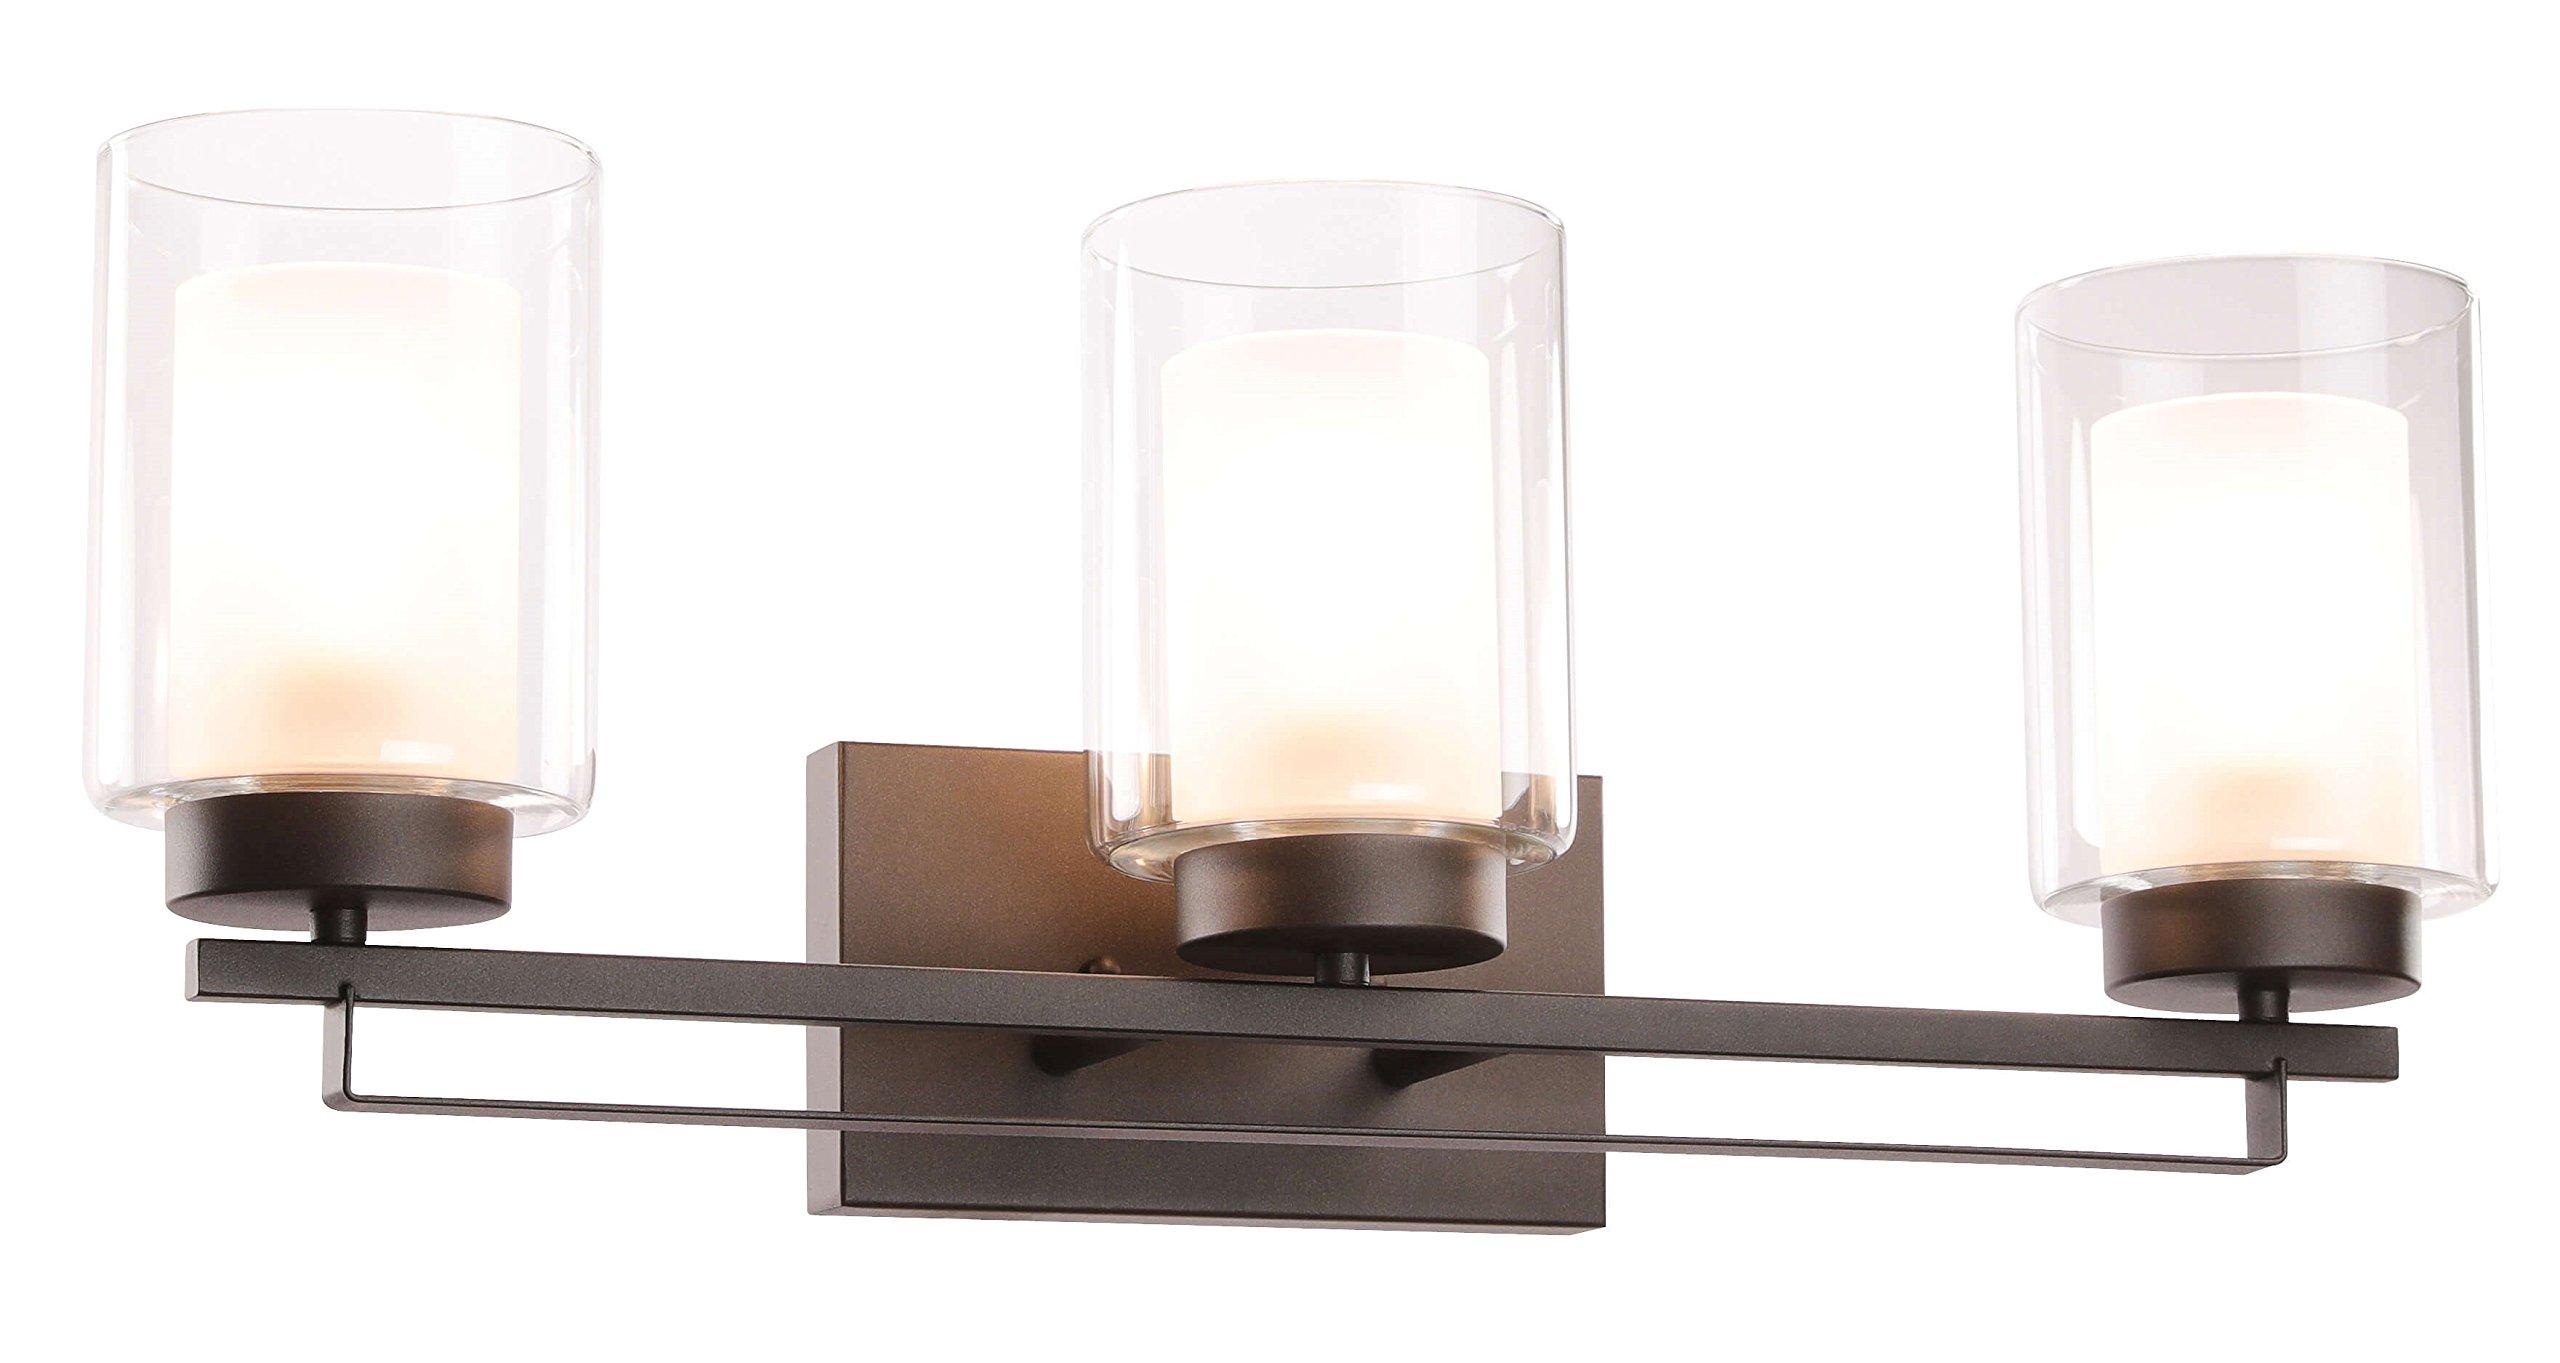 Wall Light 3 Light Bathroom Vanity Lighting with Dual Glass Shade in Dark Bronze Indoor Wall Mount Light XiNBEi-Lighting XB-W1195-3-DB